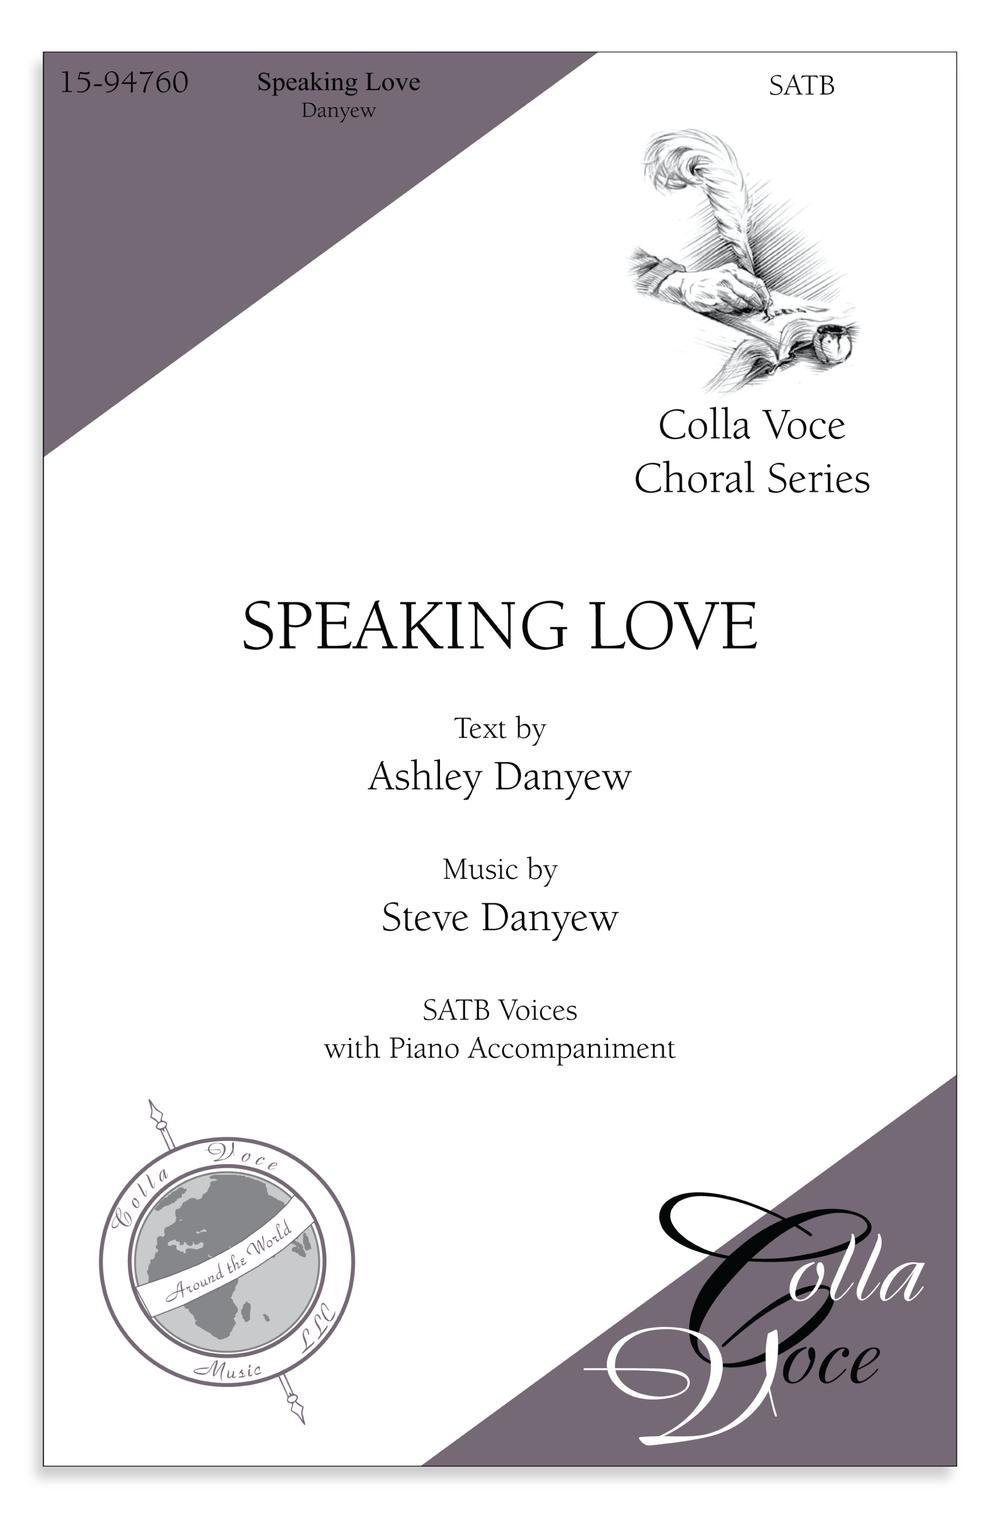 Speaking Love - Steve Danyew - SATB Choral Anthem.png